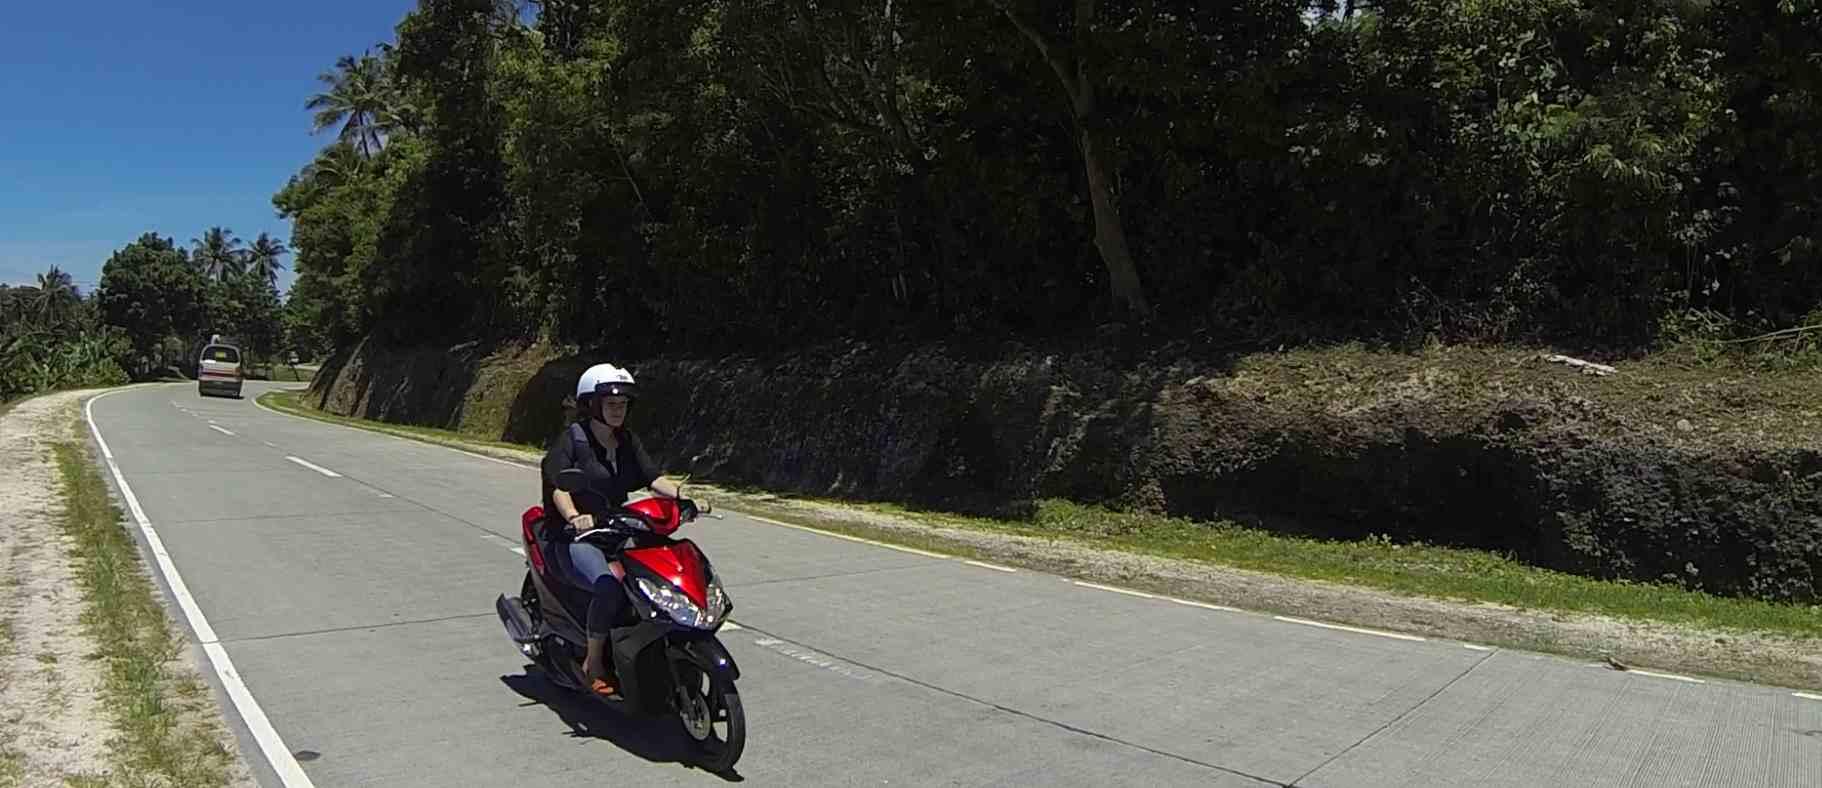 Diamond Motorcycle Rentals